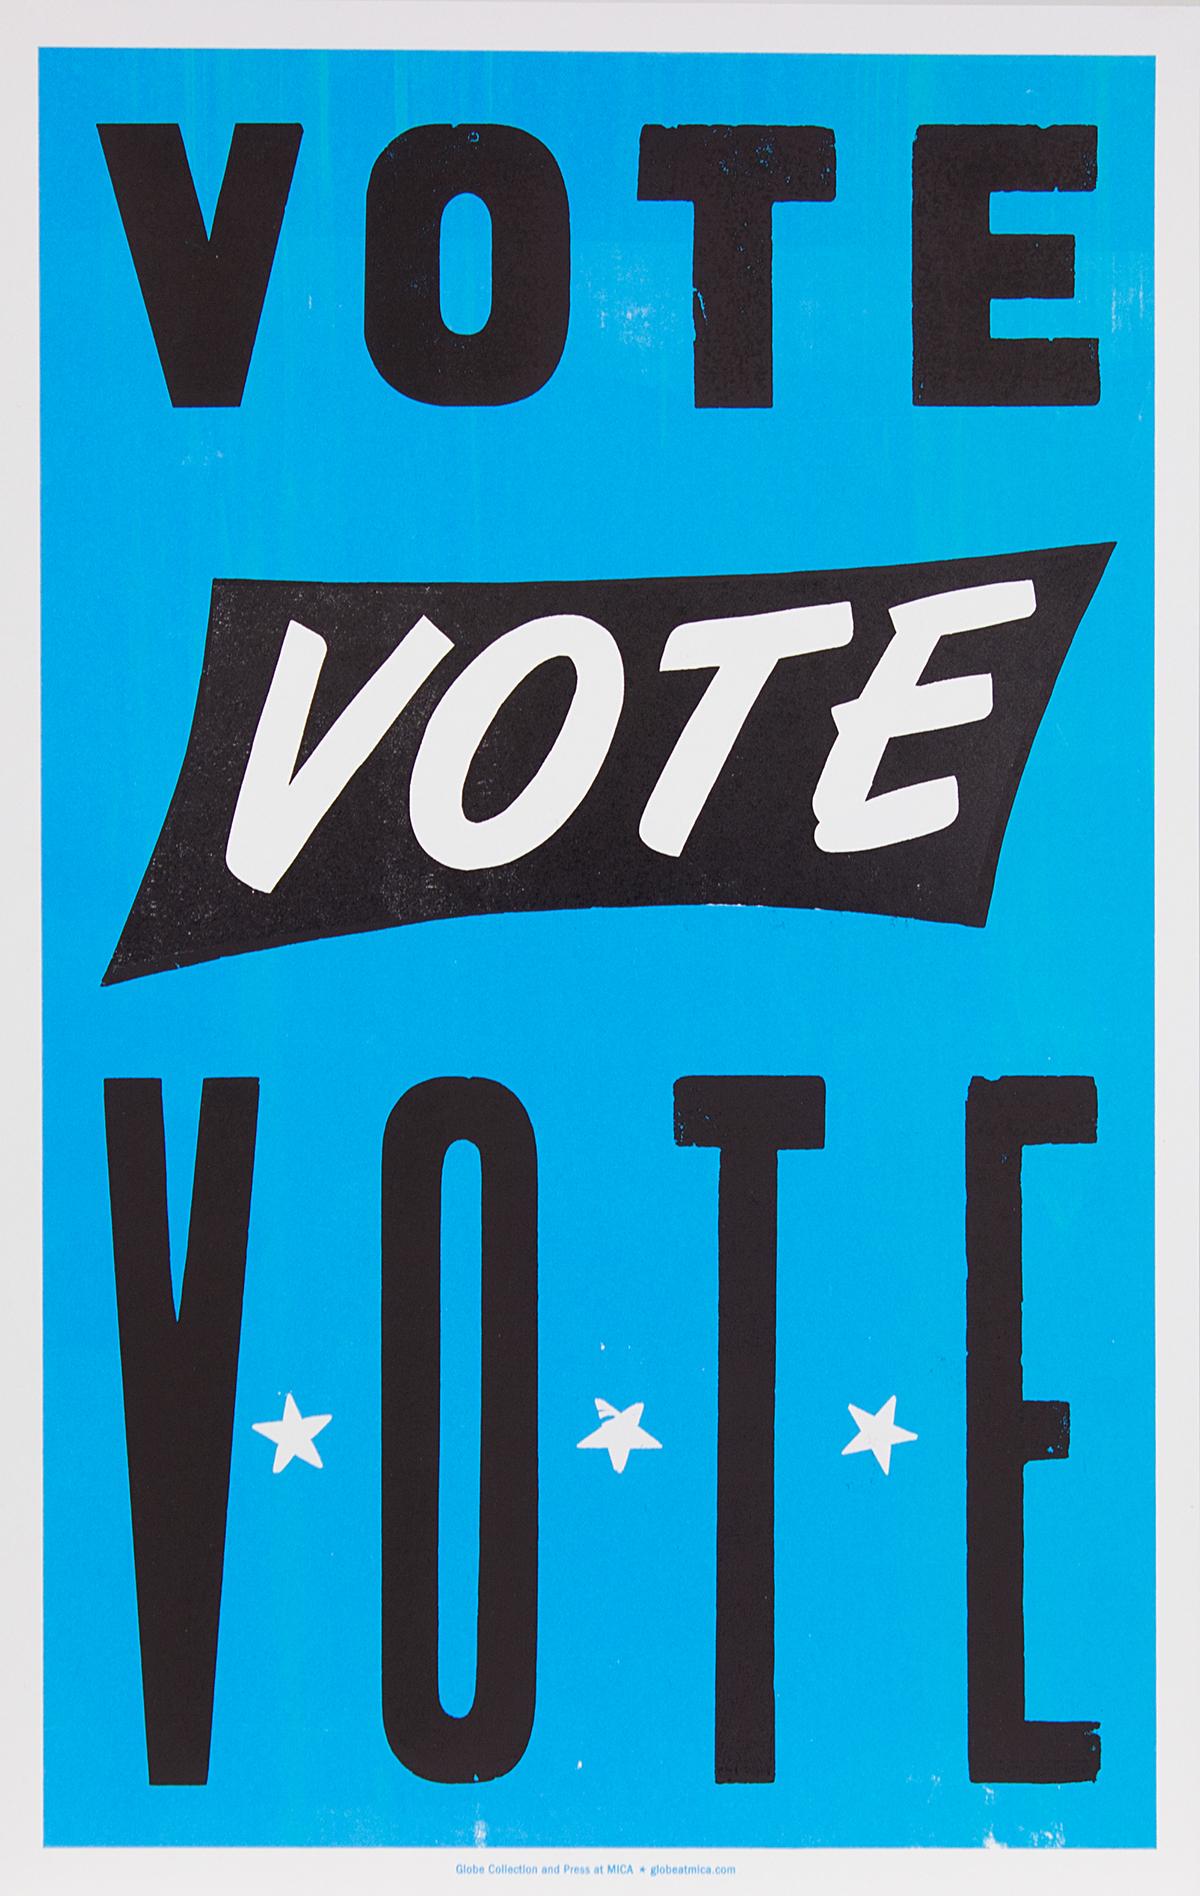 vote poster Election Trump hillary globe letterpress screen print politics